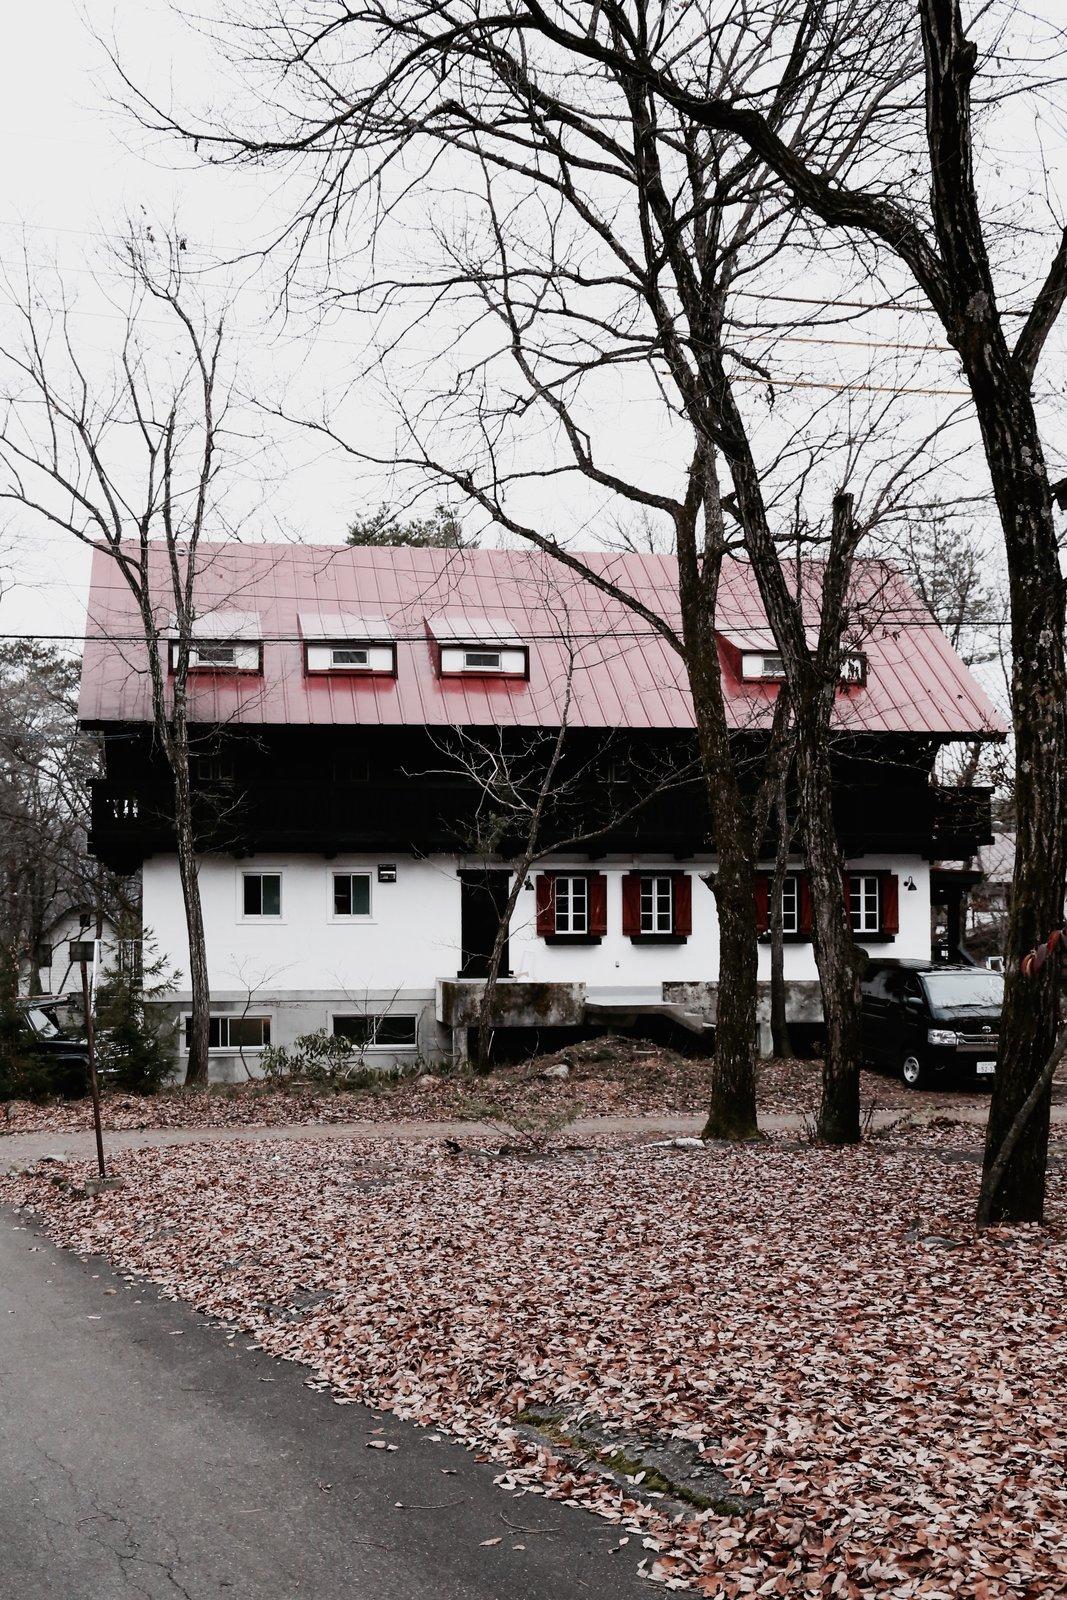 Finn Juhl Design Hotel Opens in Nagano, Japan - Photo 4 of 5